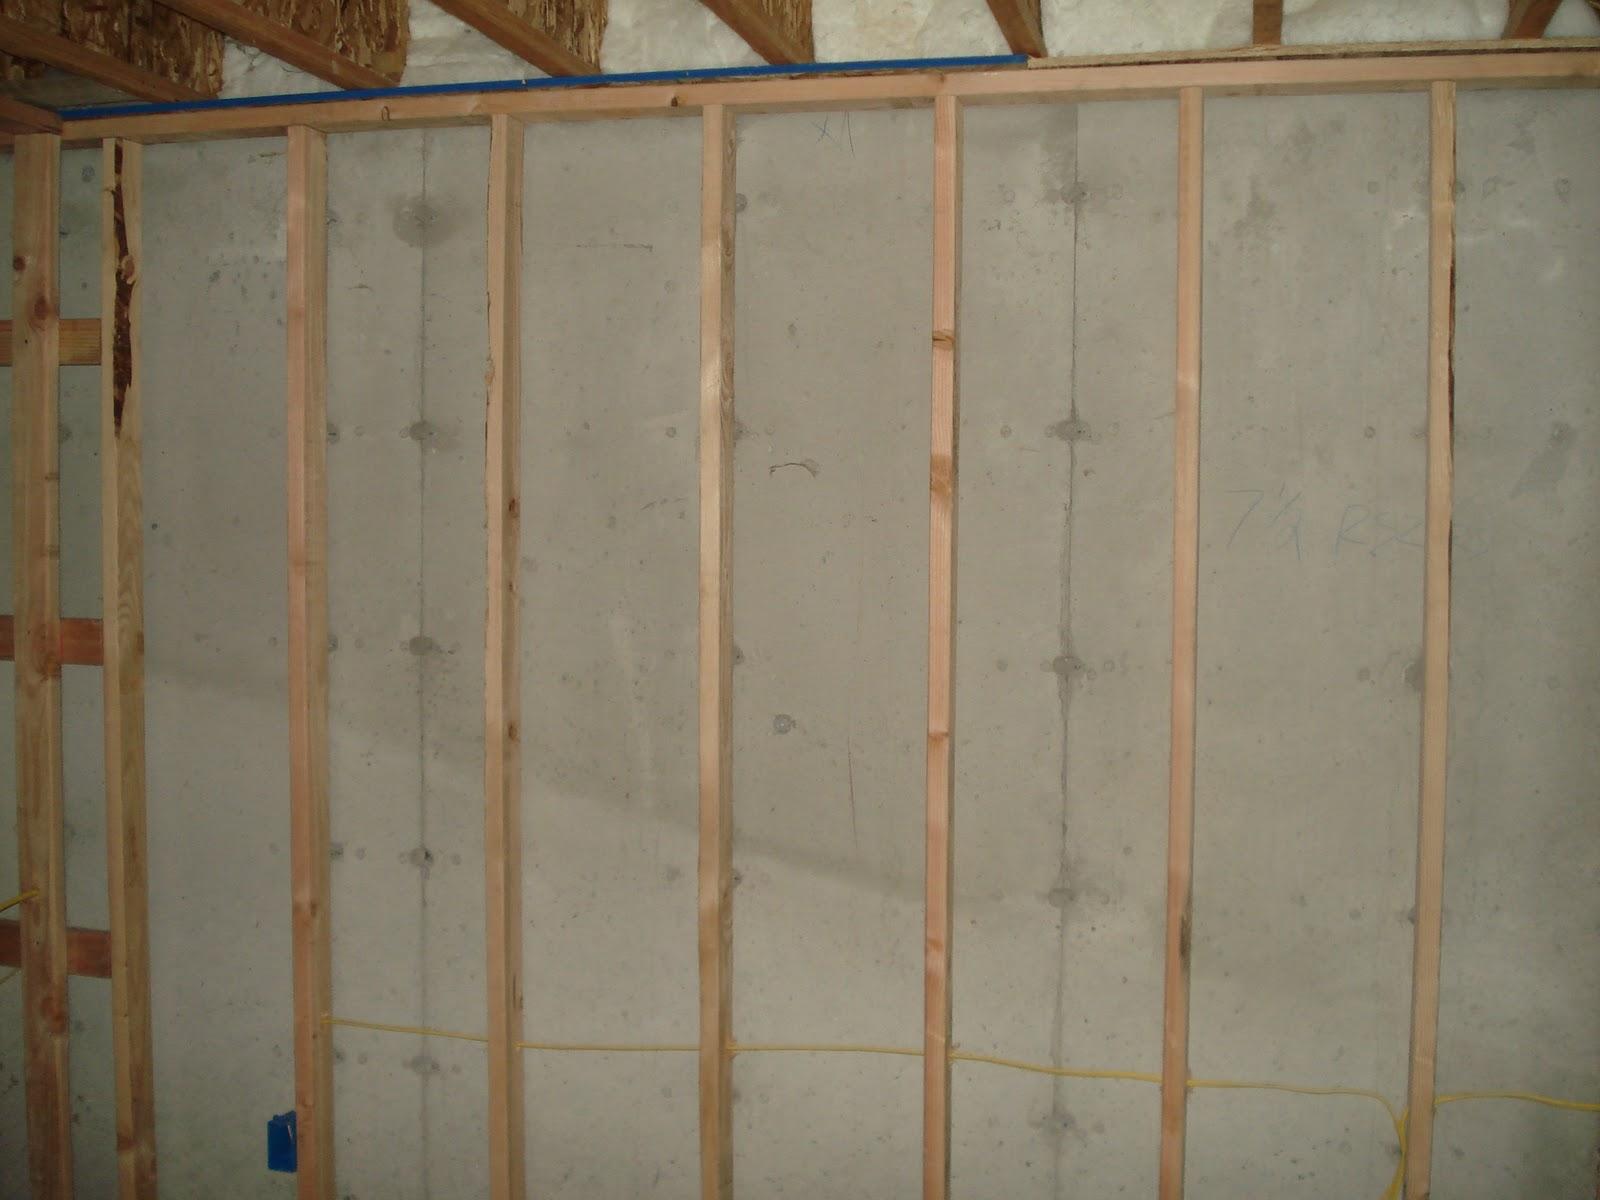 Framing Basement Wall Related Keywords Framing Basement